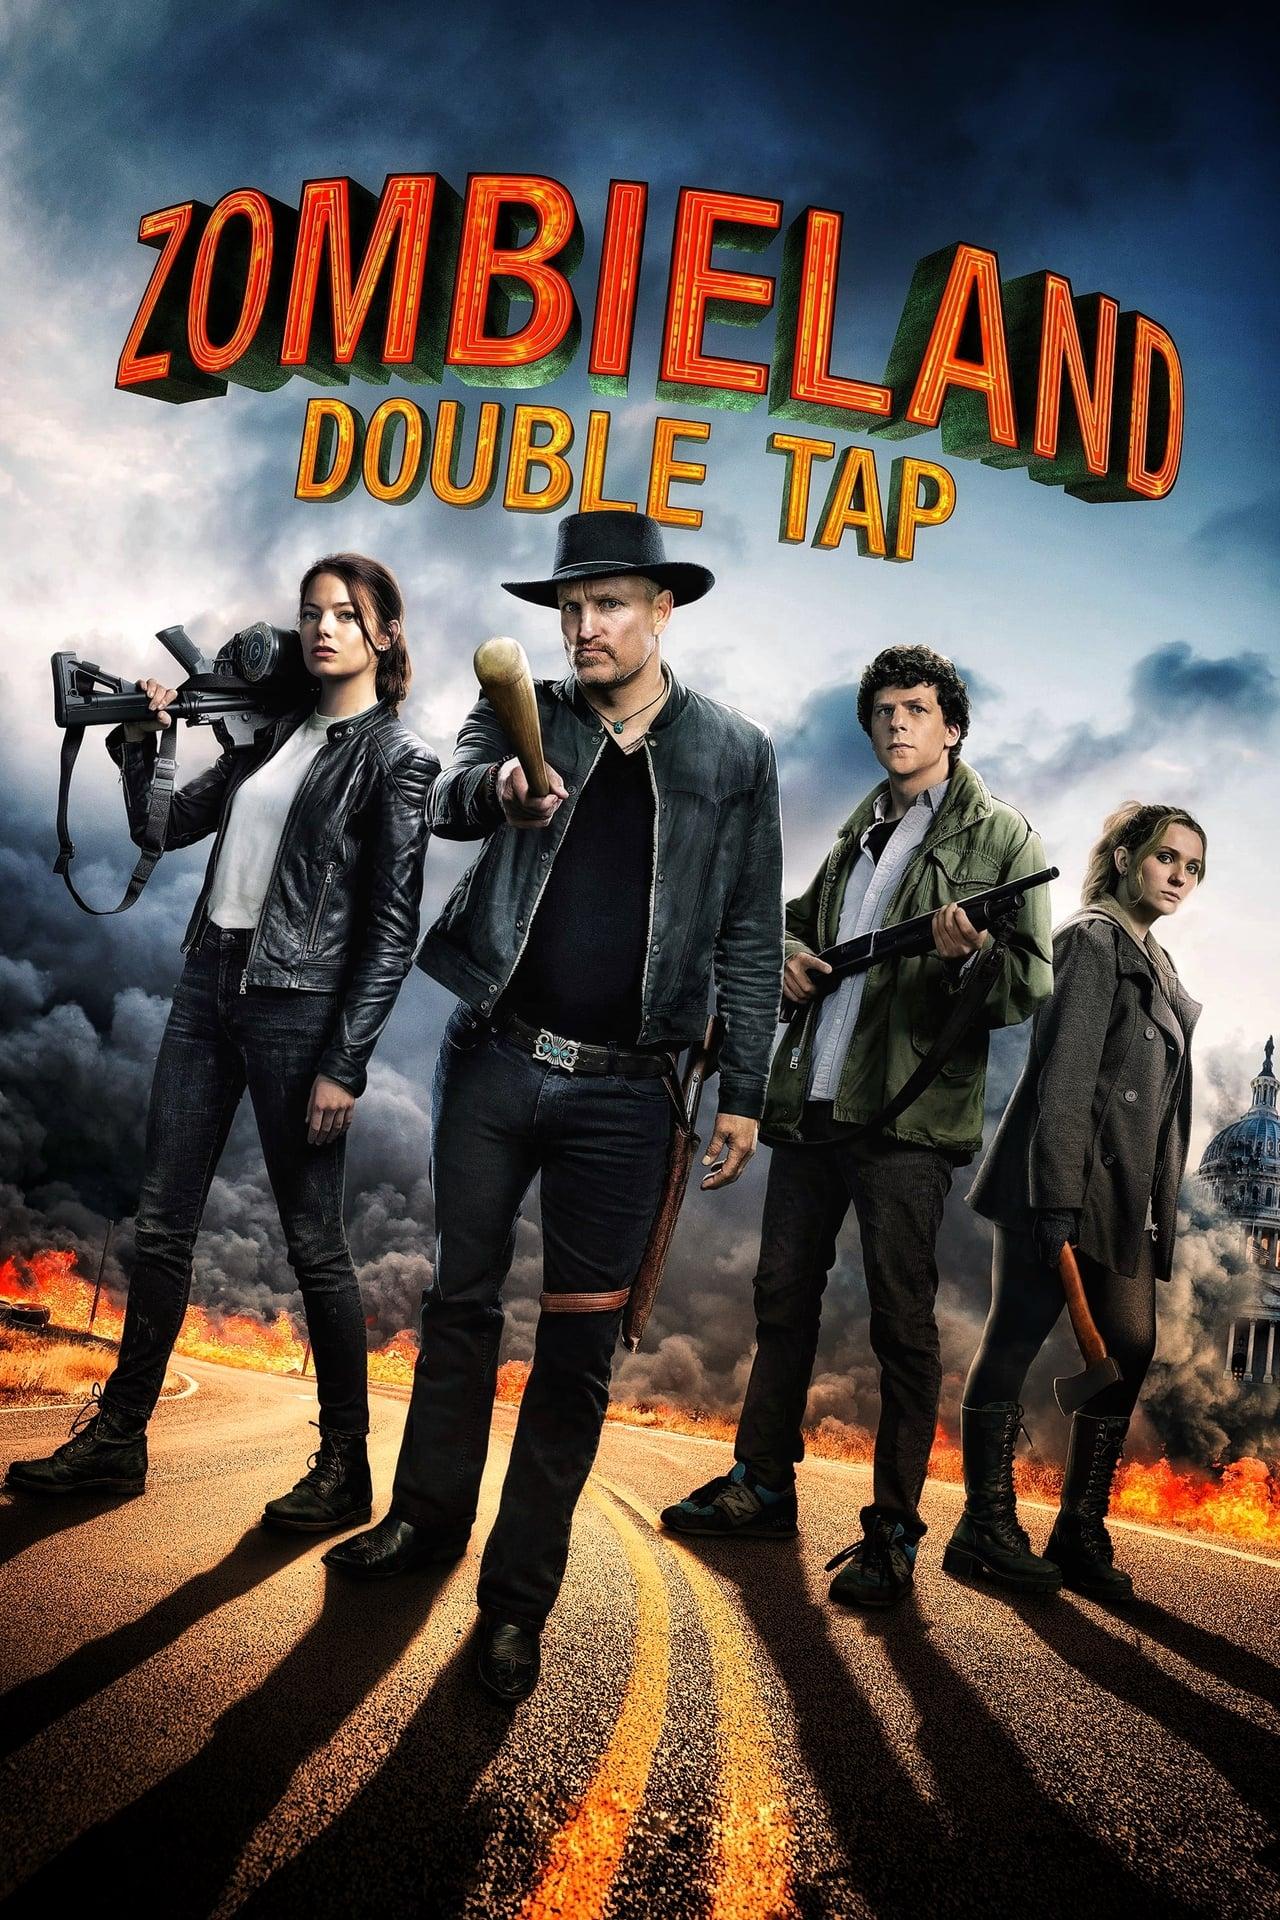 Zombieland: